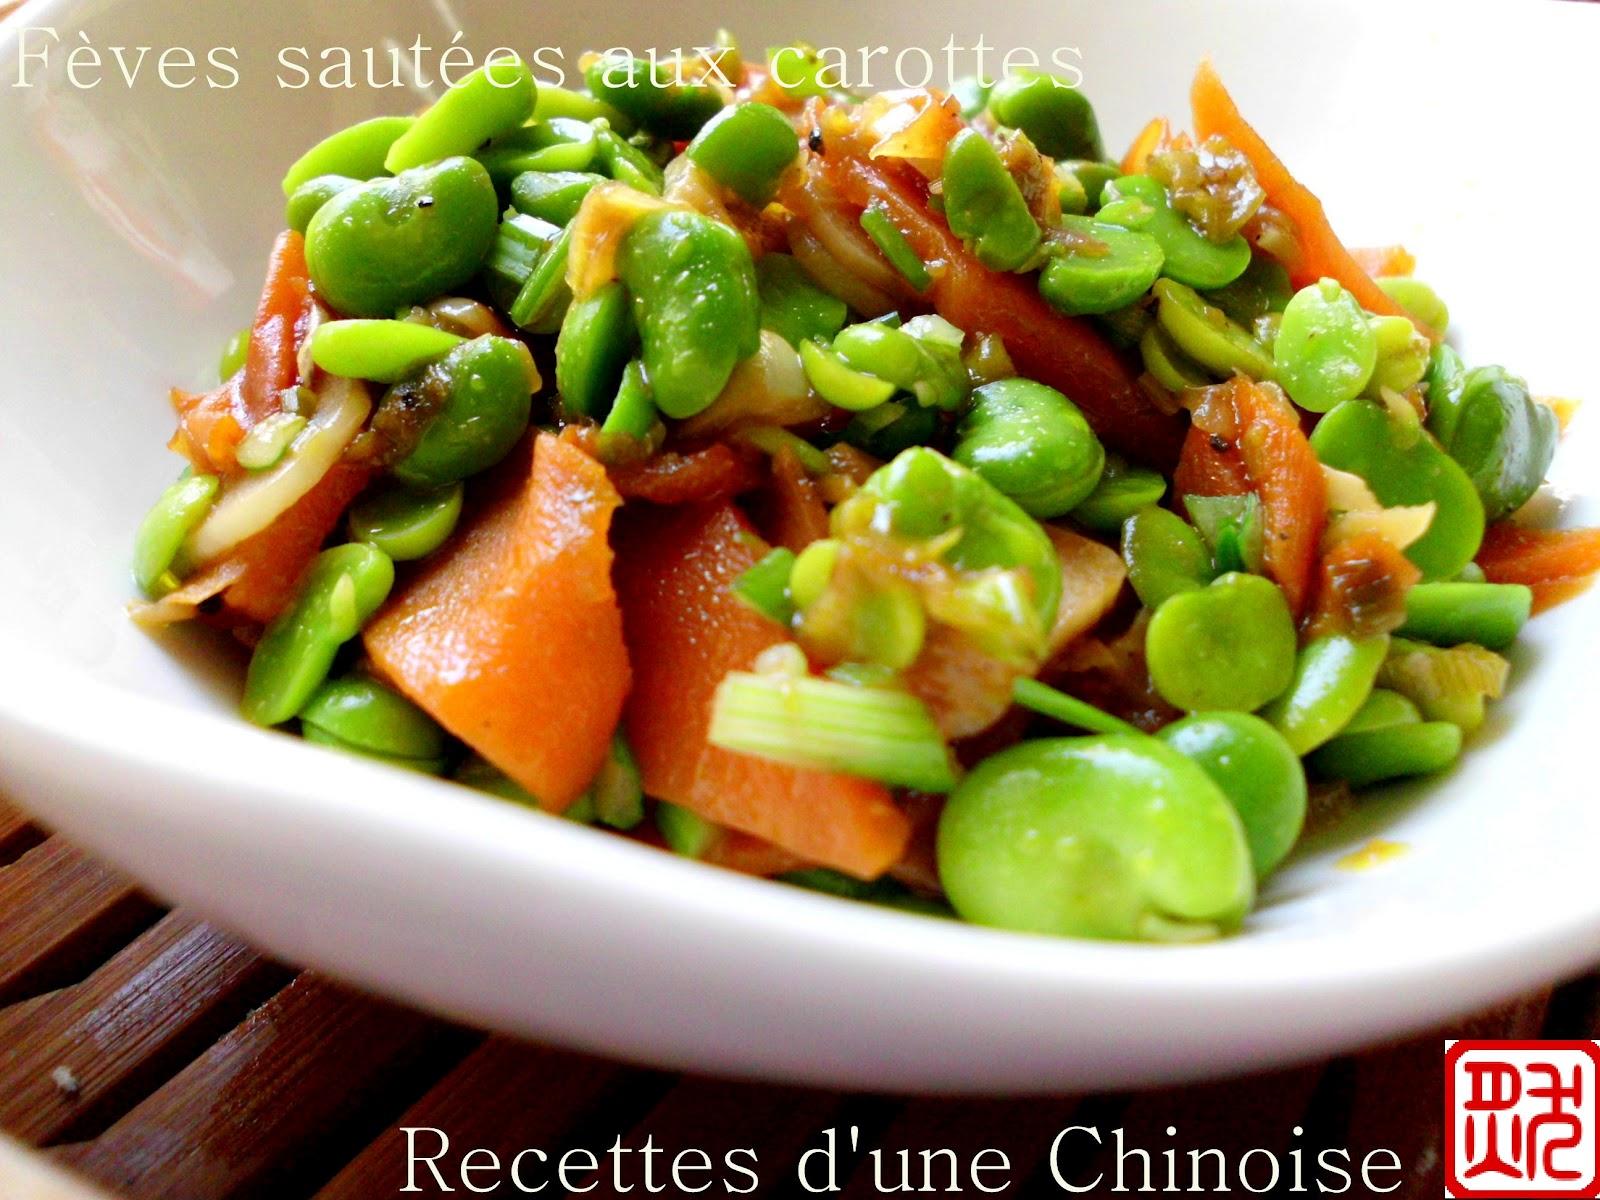 Recettes D Une Chinoise Feves Fraiches Sautees Aux Carottes 胡萝卜